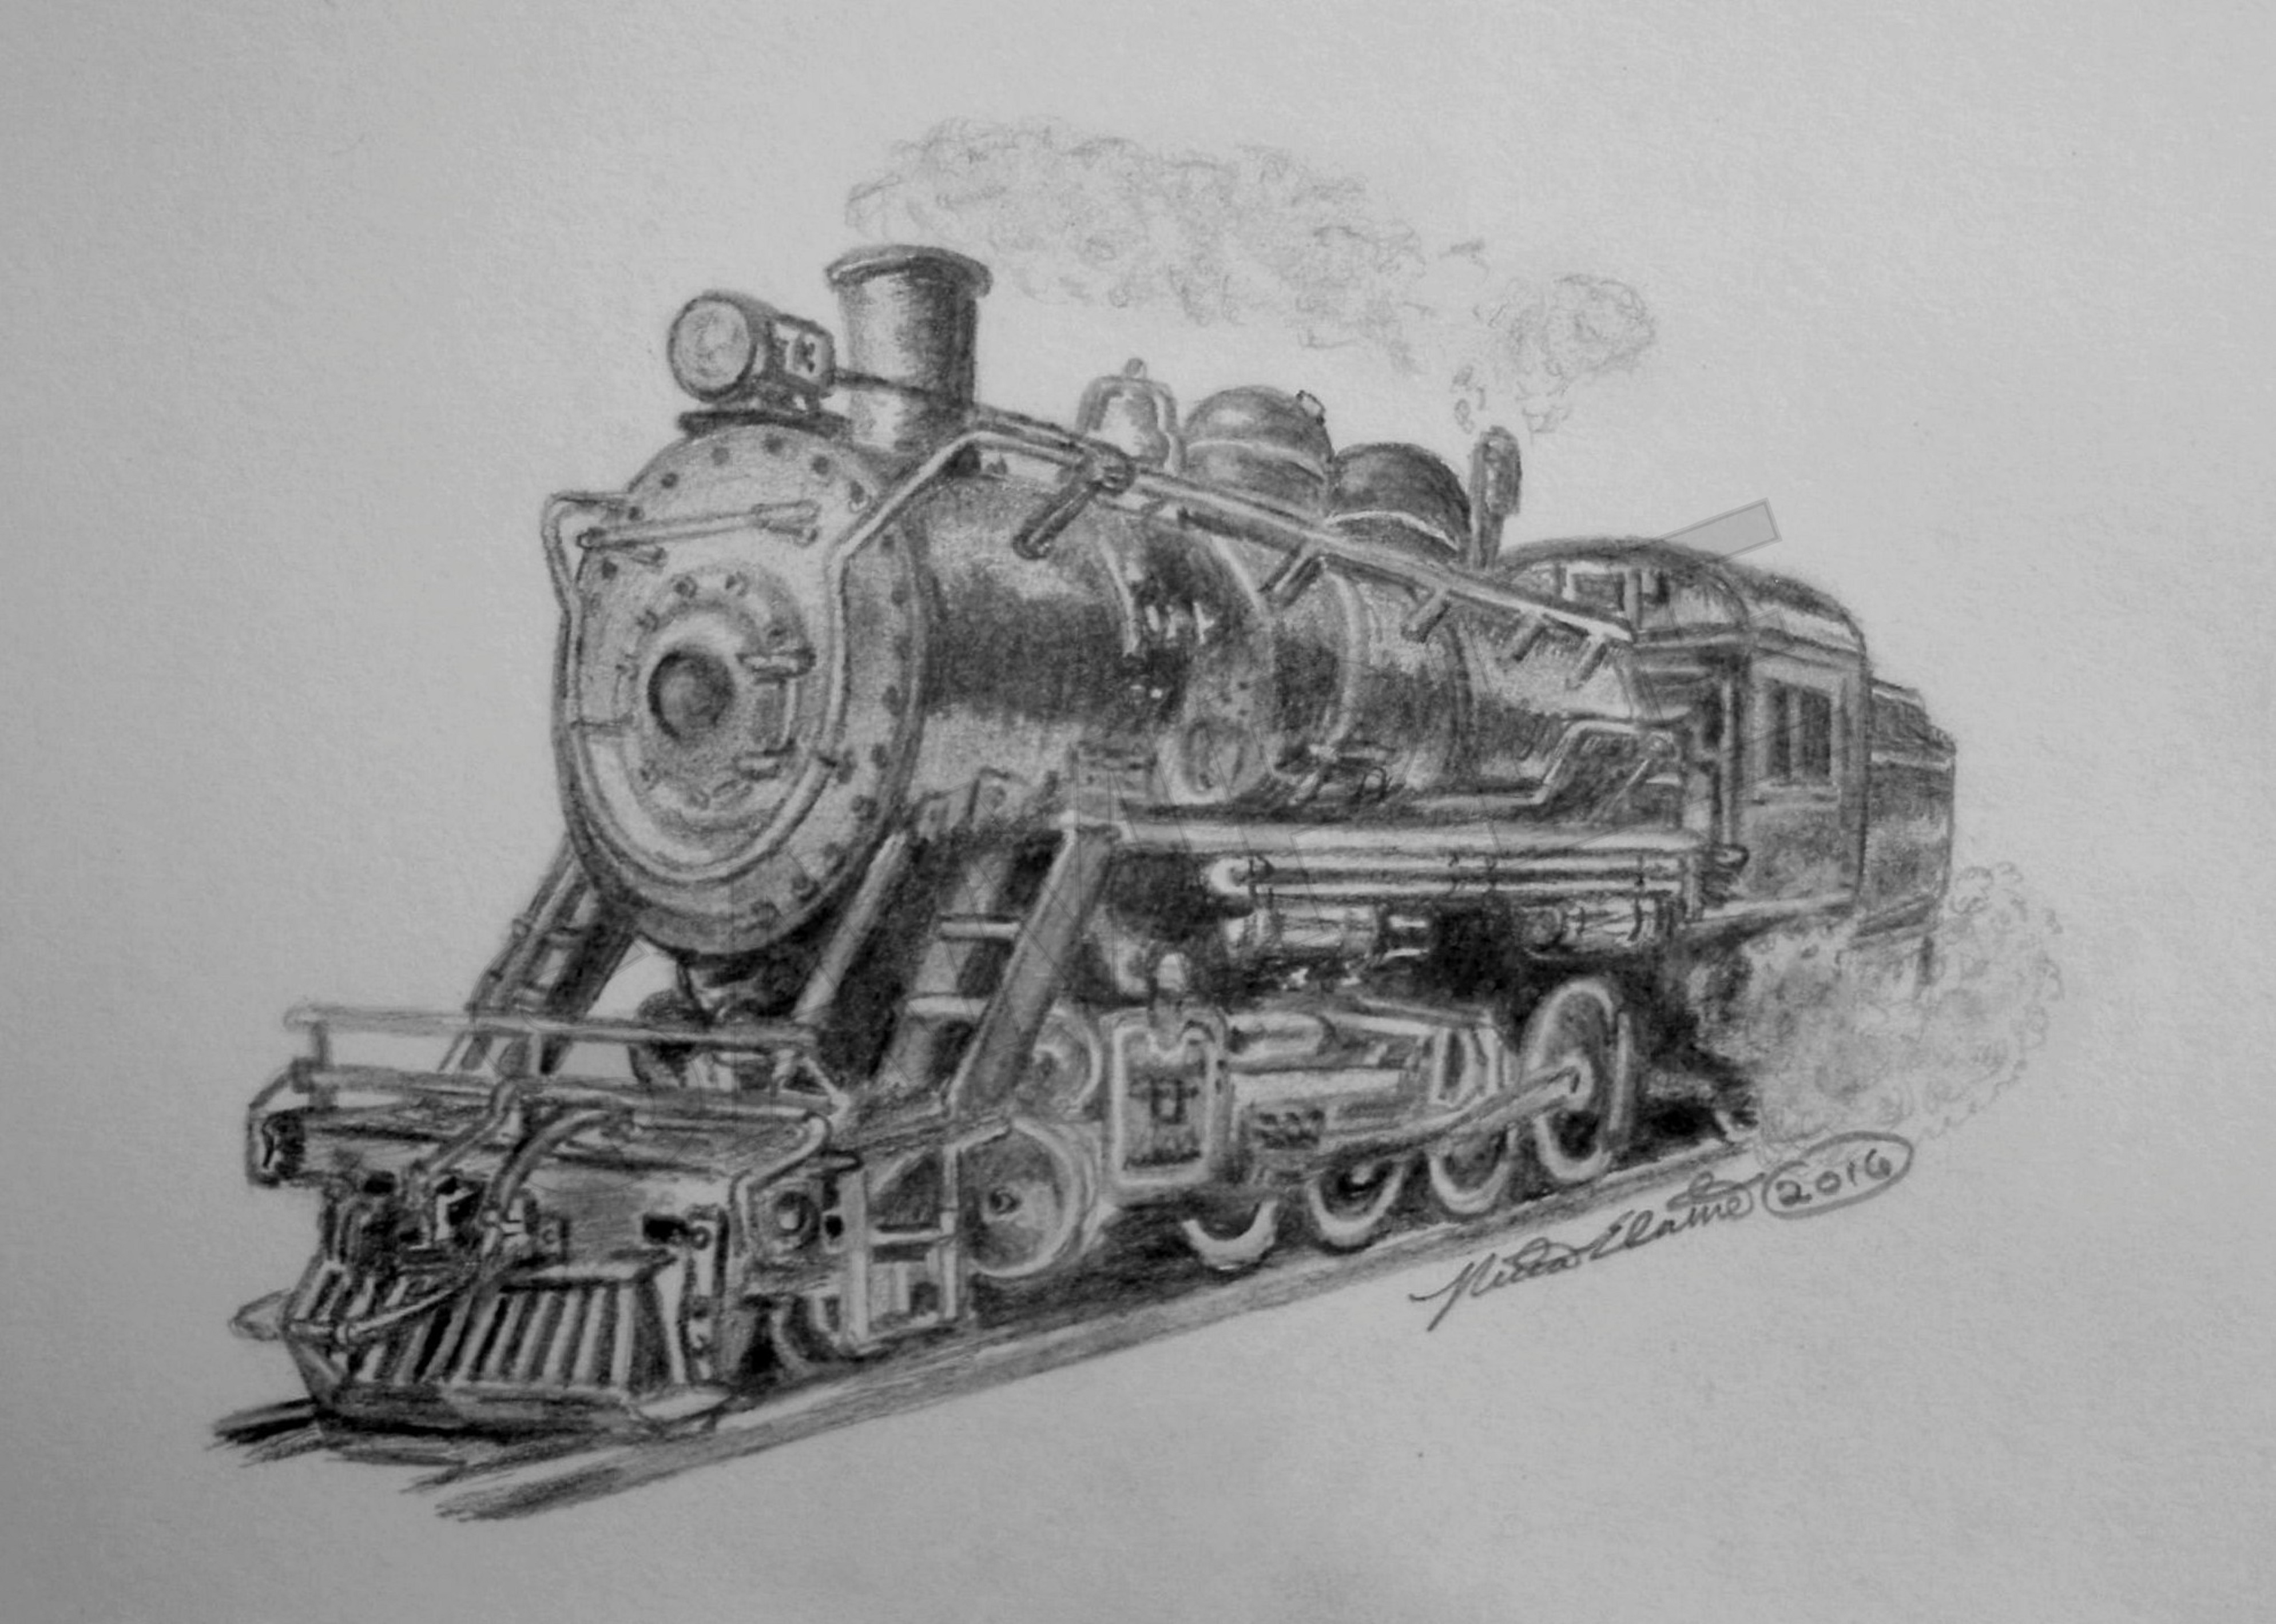 Steam Train By Nethompsonoriginal Framed Artwork Graphite 1960 Pontiac Gto Drawings Drawing Size 6x8